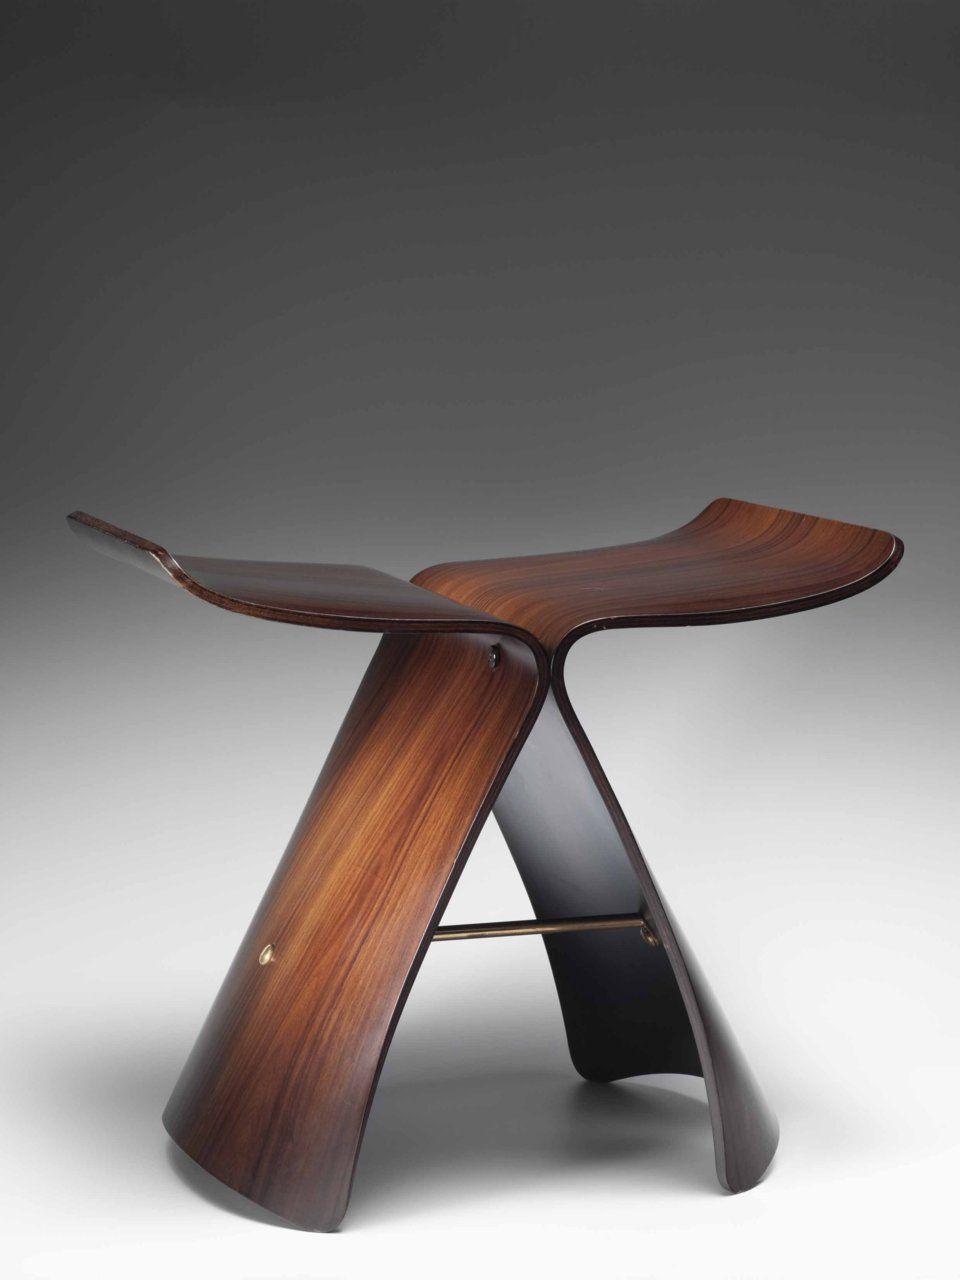 Butterfly chair sori yanagi - Taburete Butterfly O Butterfly Stool De Sori Yanagi Dise Ador Japones Atemporal Por